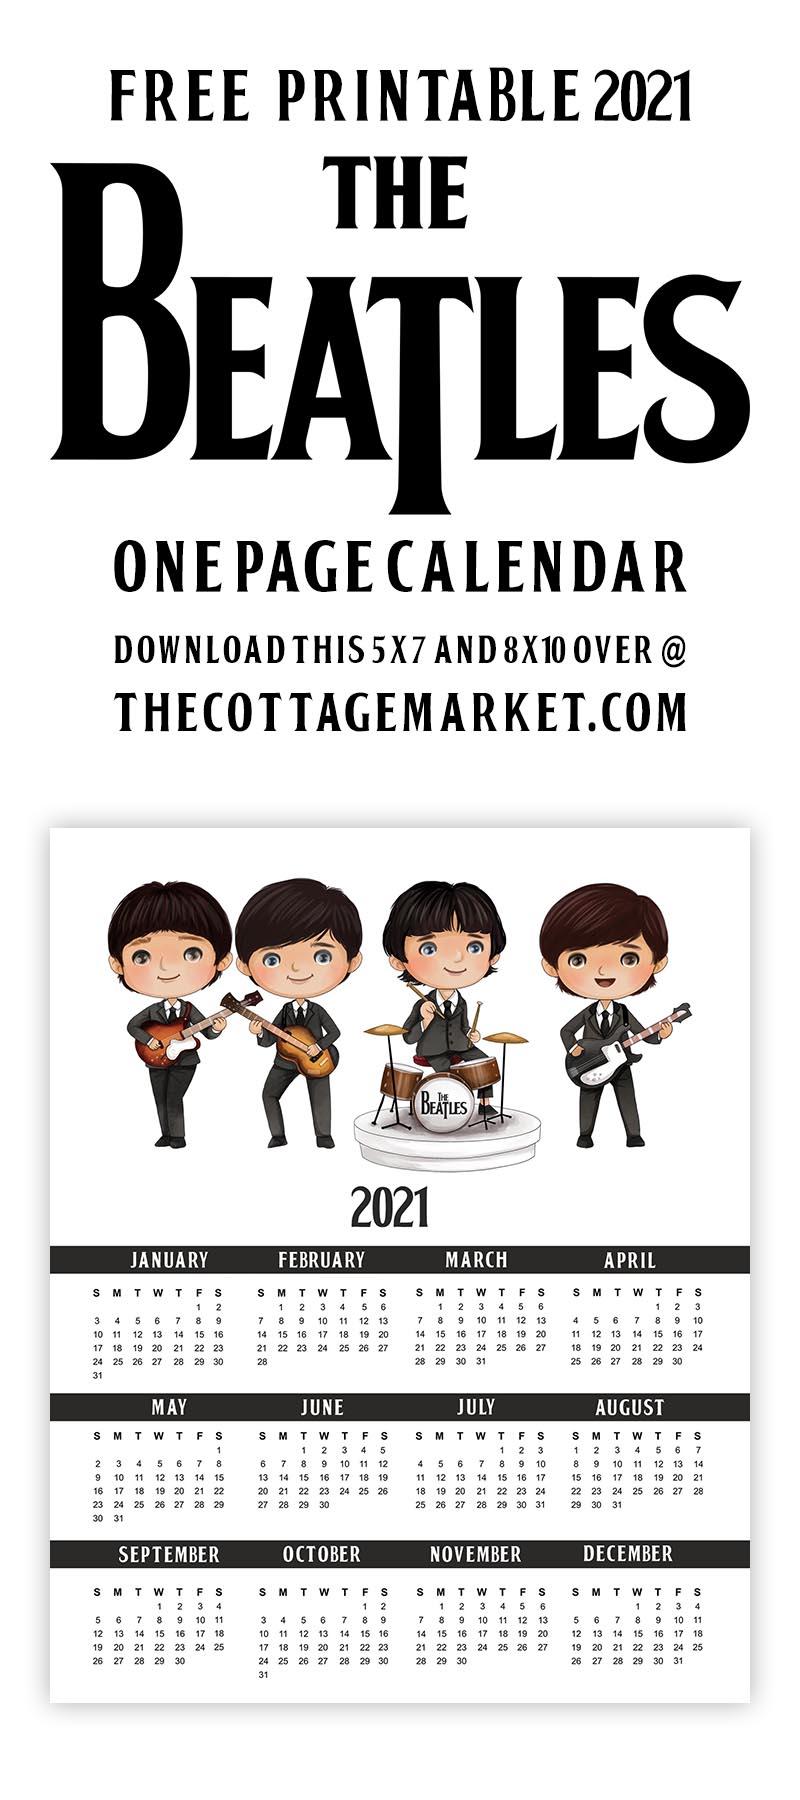 https://thecottagemarket.com/wp-content/uploads/2020/12/tcm-2021-TheBeatles-1-onepage-calendar-t-1.jpg